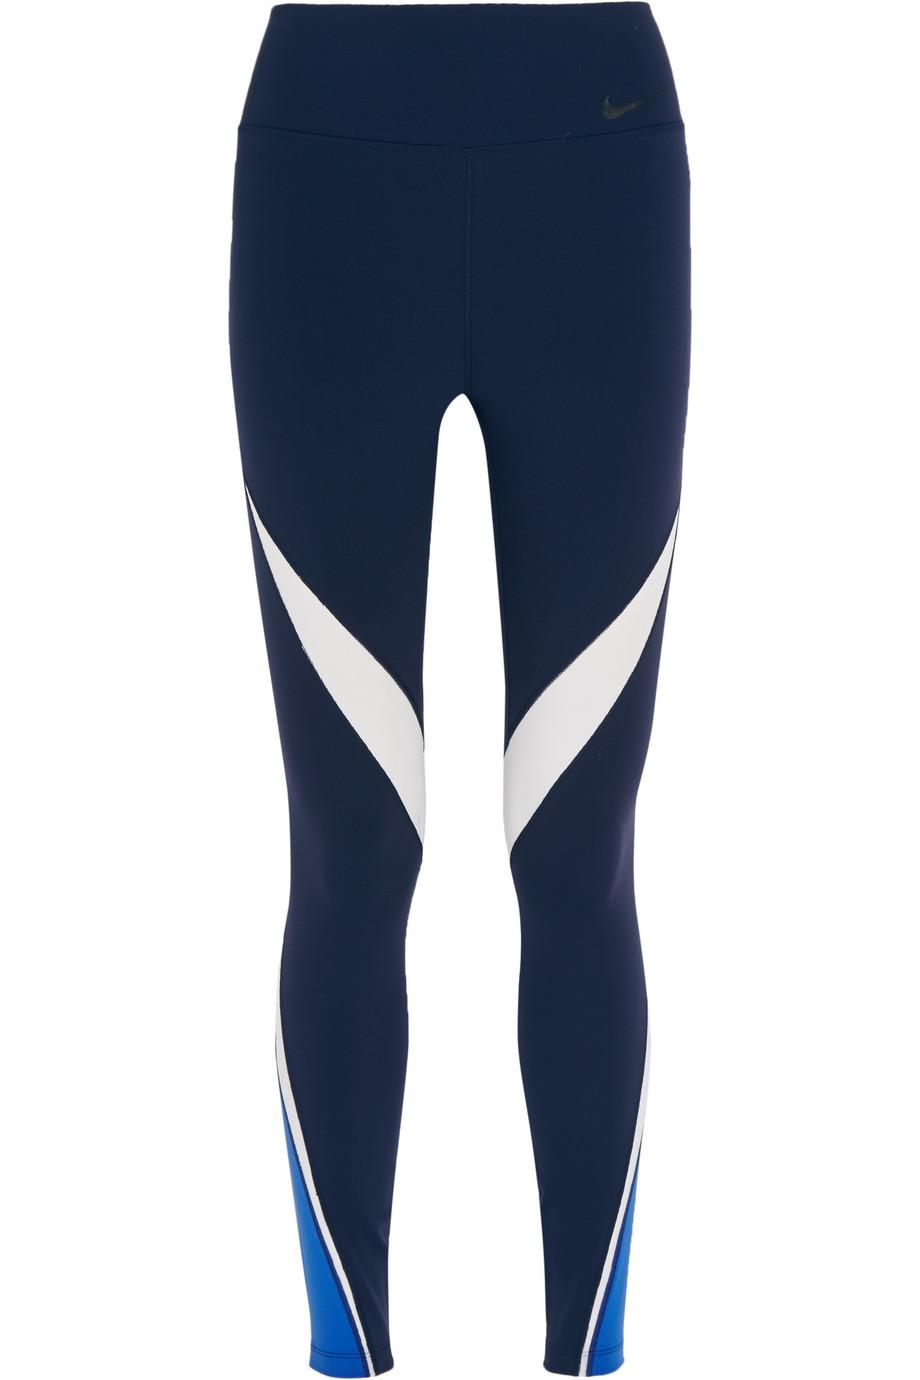 Nike Legendary Mesh-Paneled Stretch-Jersey Leggings, Midnight Blue, Women's, Size: XS